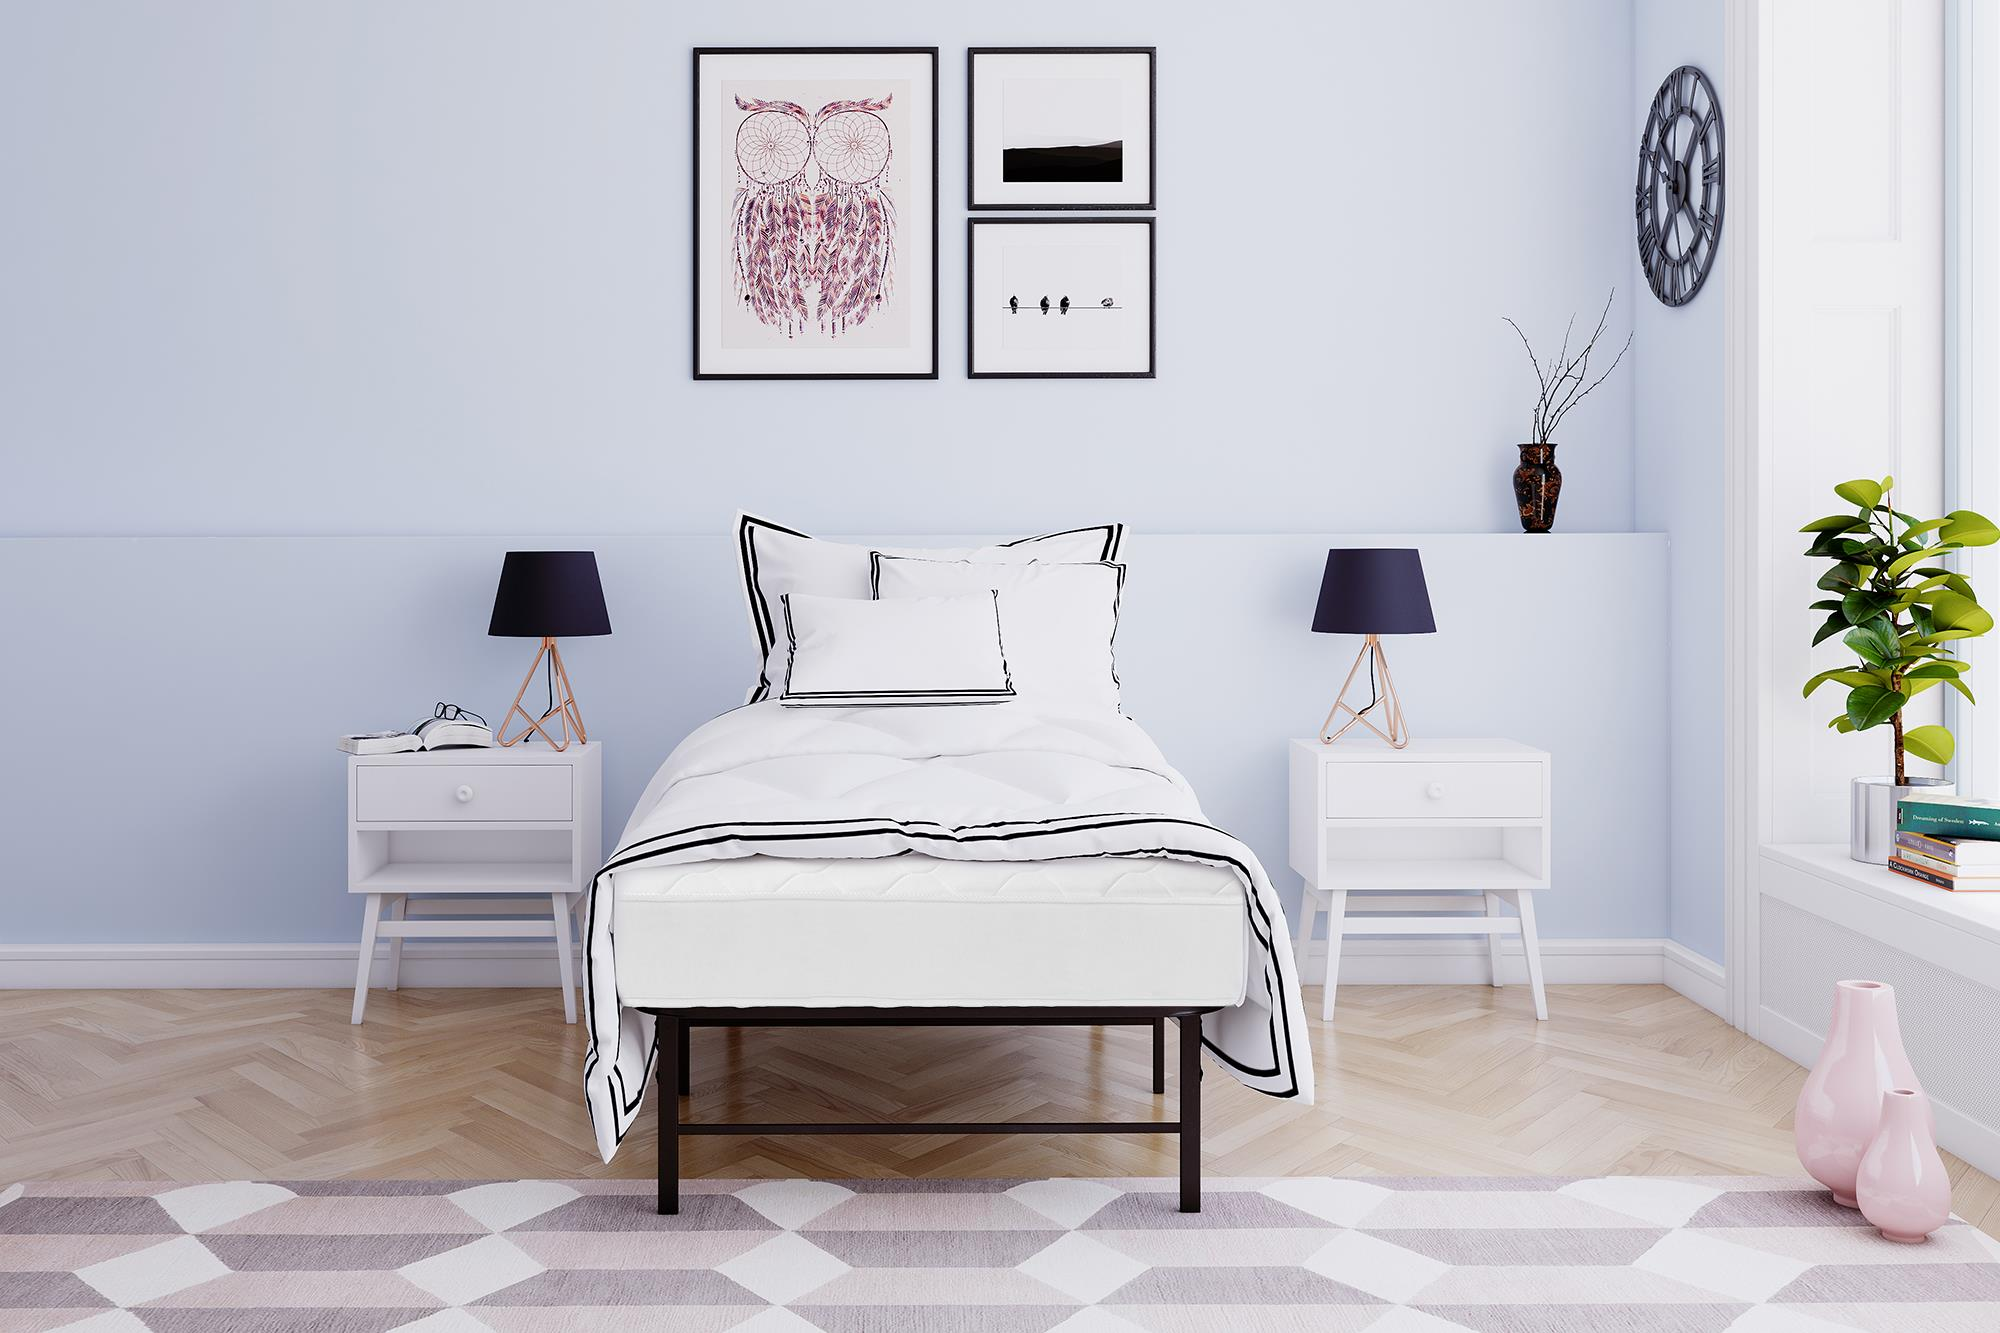 Mainstays 6 Inch Coil Mattress & Metal Platform Bed, Multiple